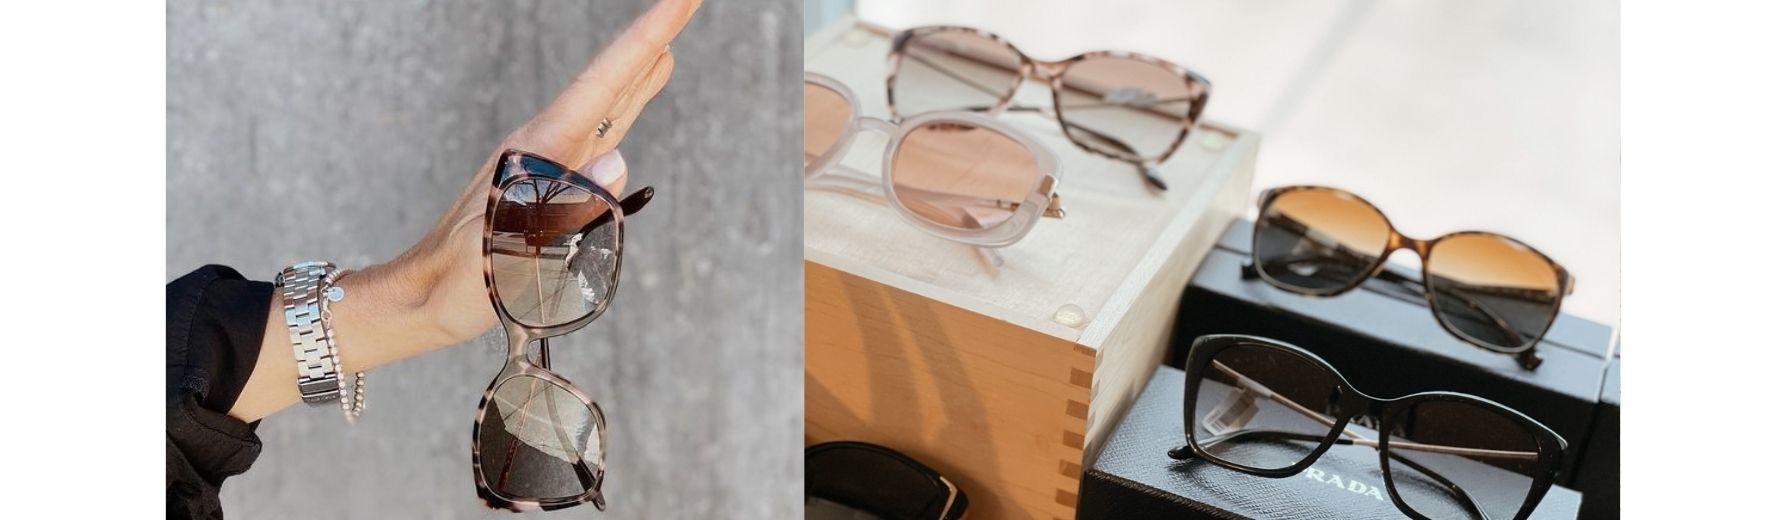 Shop Prada, Tory Burch, Ray Ban Sunglasses online.